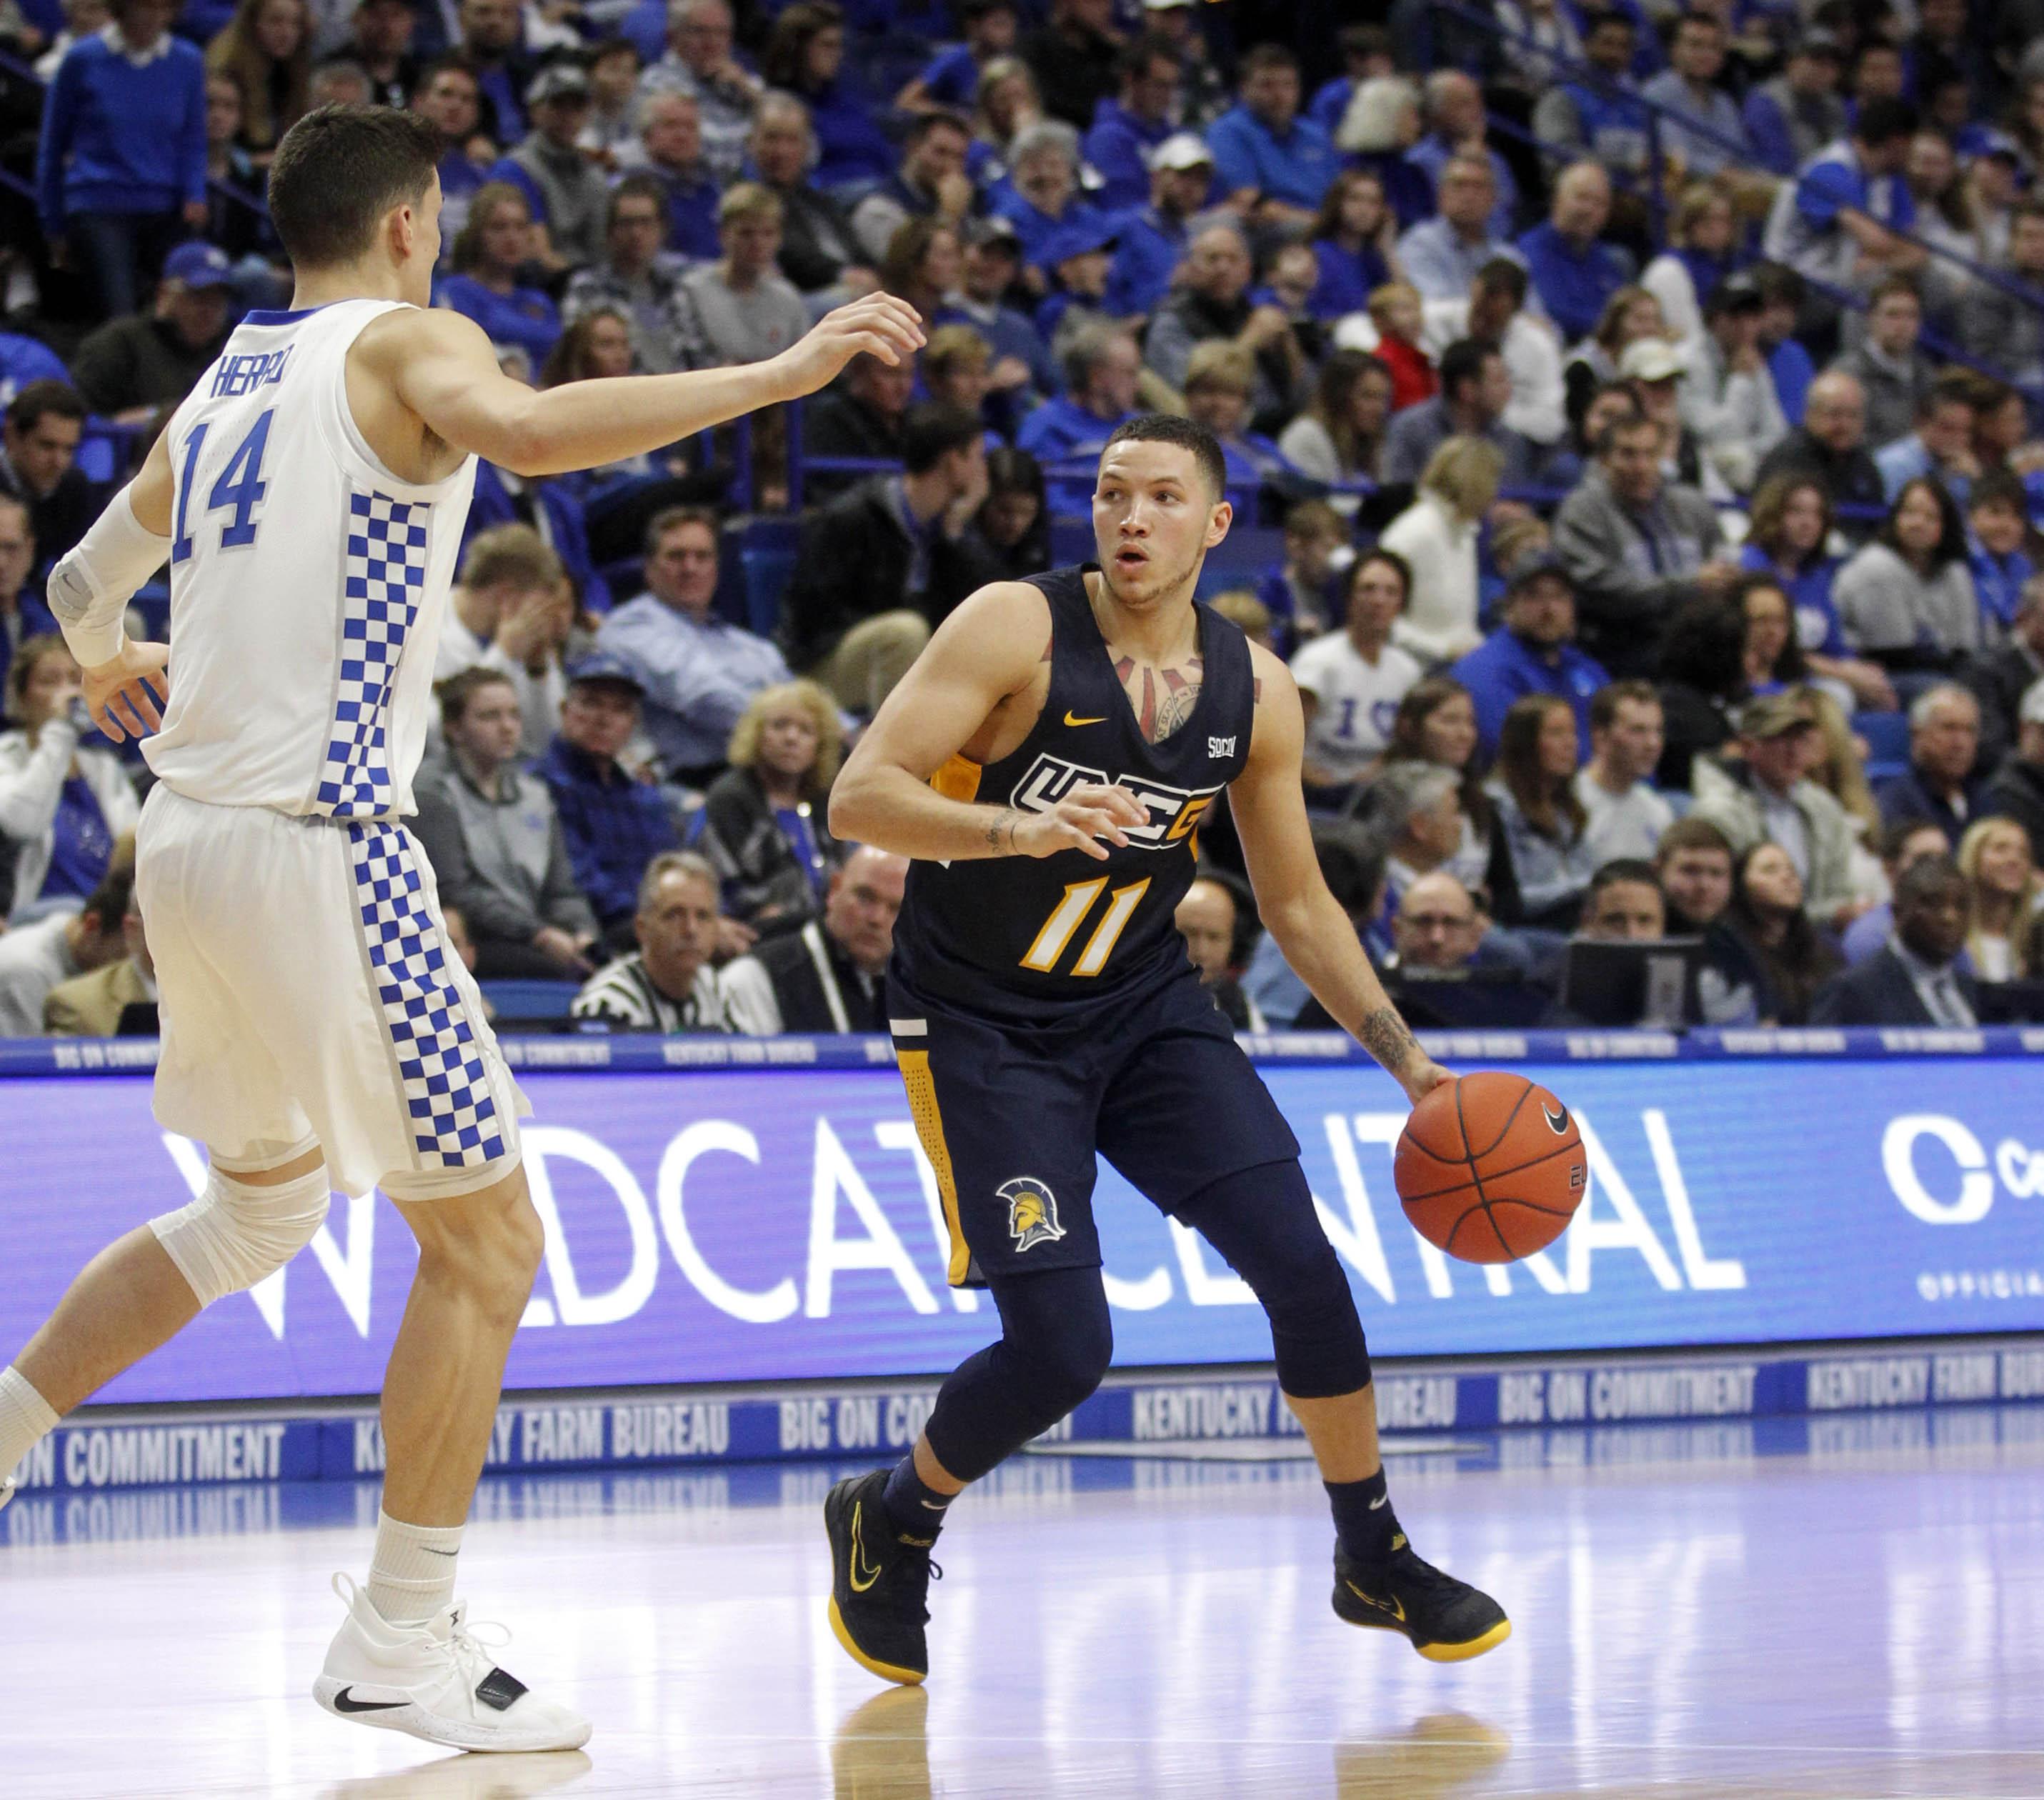 NCAA Basketball: NC-Greensboro at Kentucky